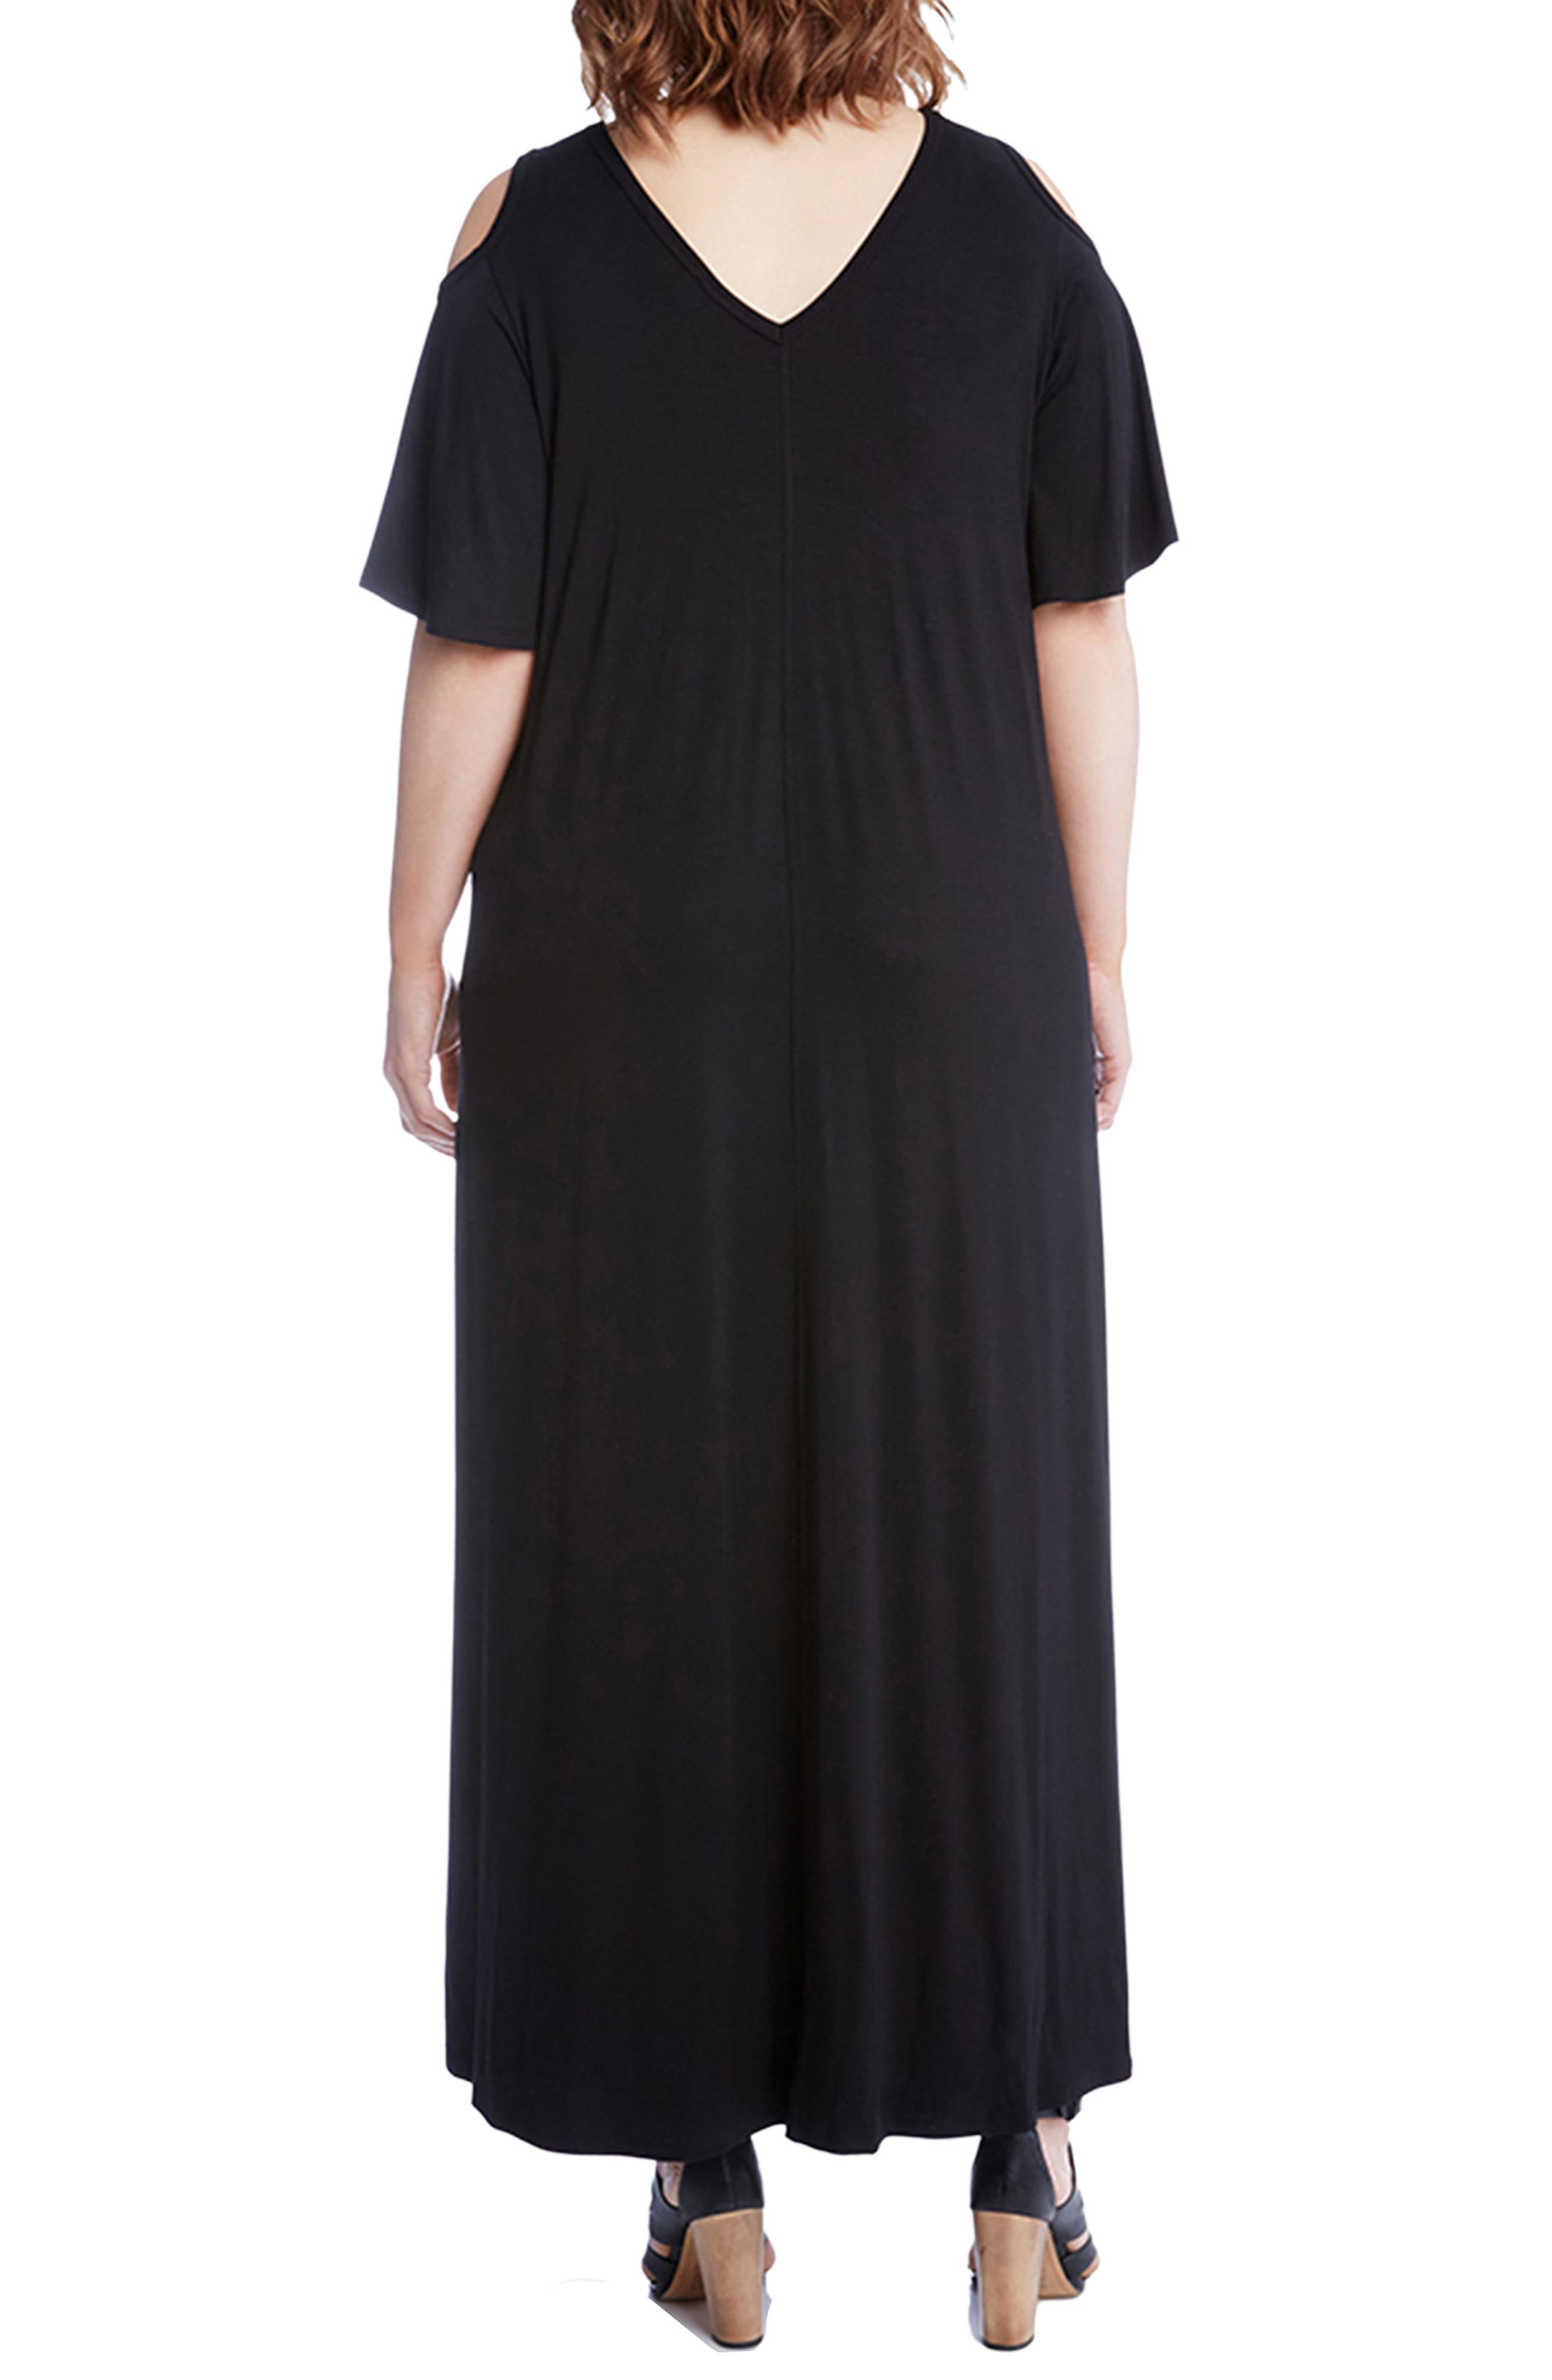 Cold Shoulder A-Line Maxi Dress,                             Alternate thumbnail 2, color,                             Black